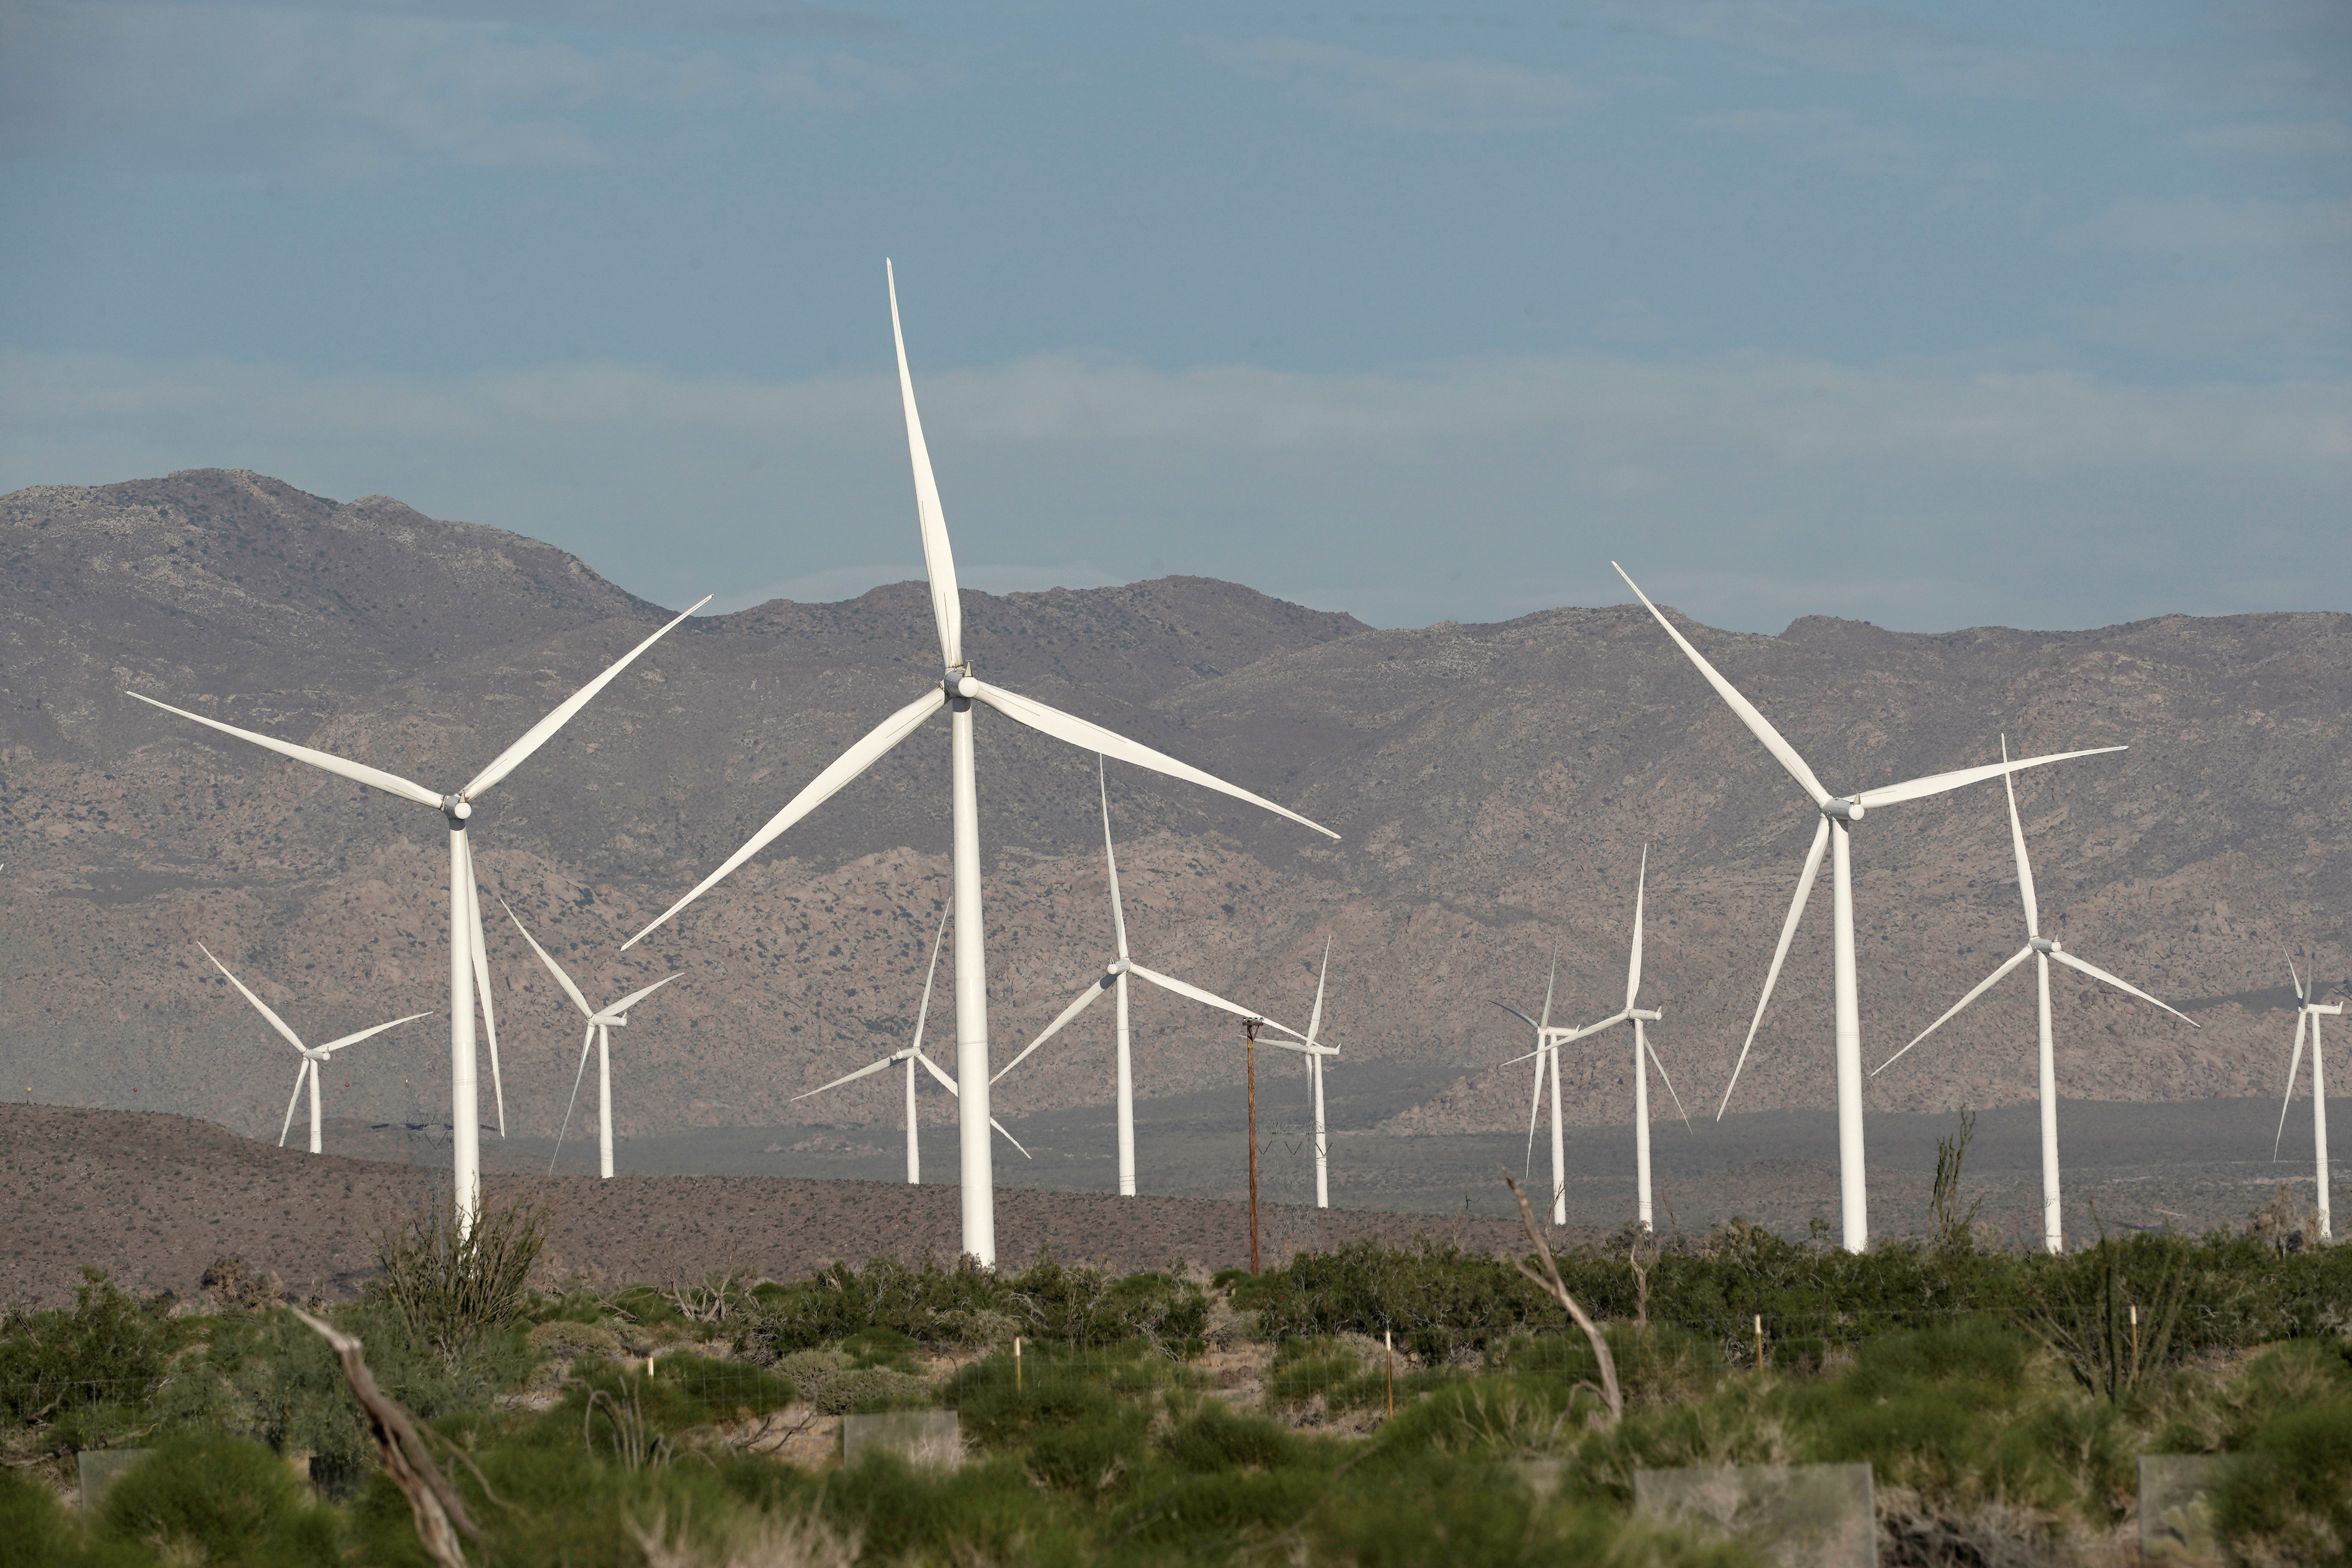 Power-generating Siemens 2.37 megawatt (MW) wind turbines are seen at the Ocotillo Wind Energy Facility  California, U.S., May 29, 2020.  REUTERS/Bing Guan